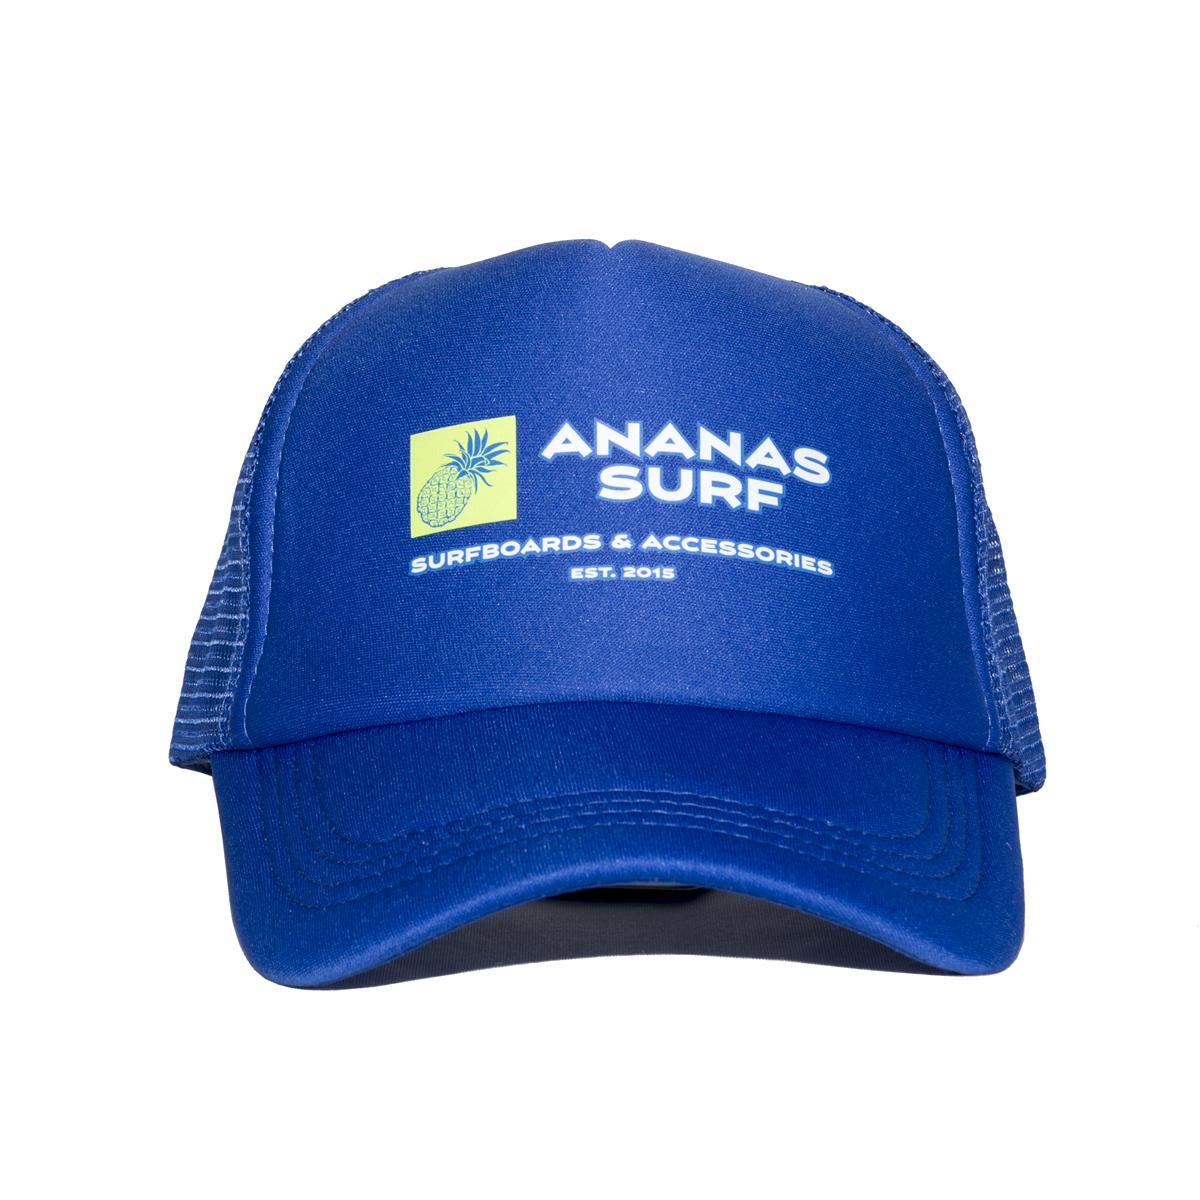 Ananas Surf The Logo beach mesh cap blue front